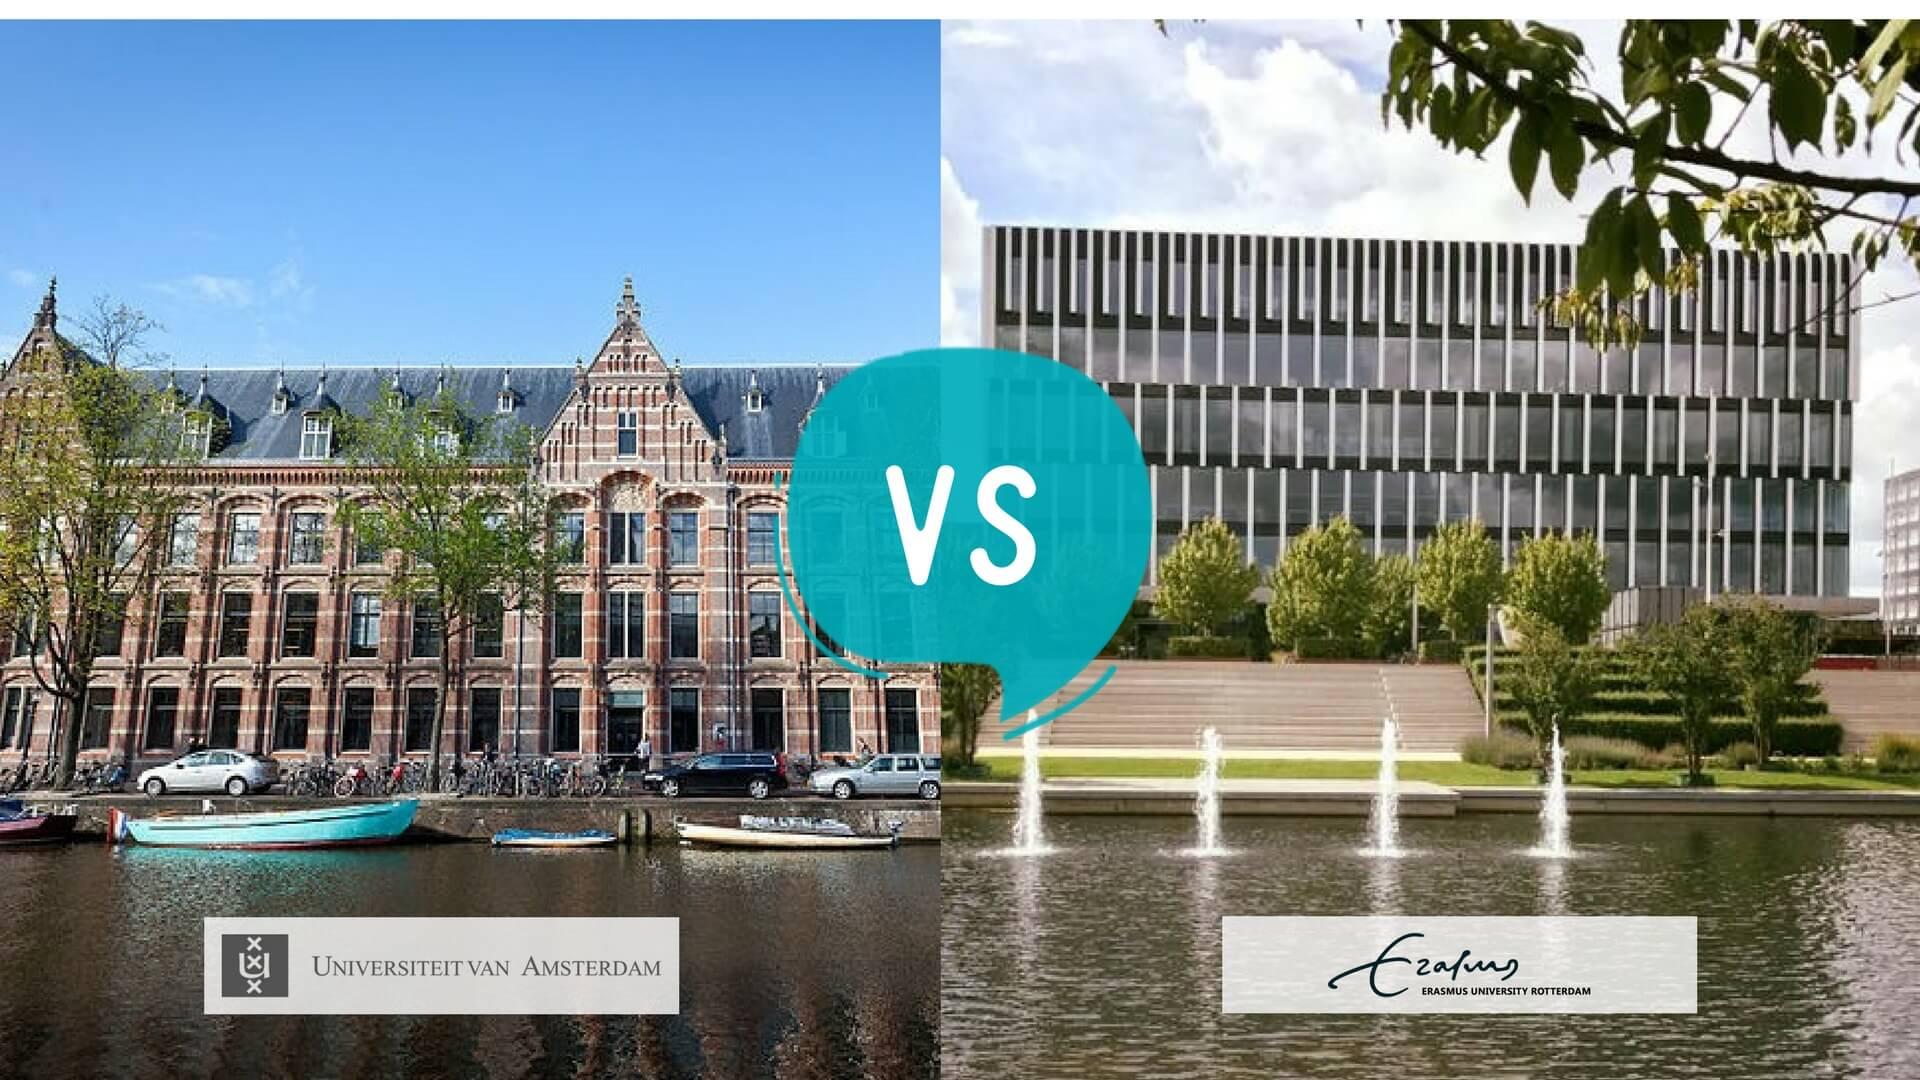 University of Amsterdam (UvA) Vs Erasmus University of